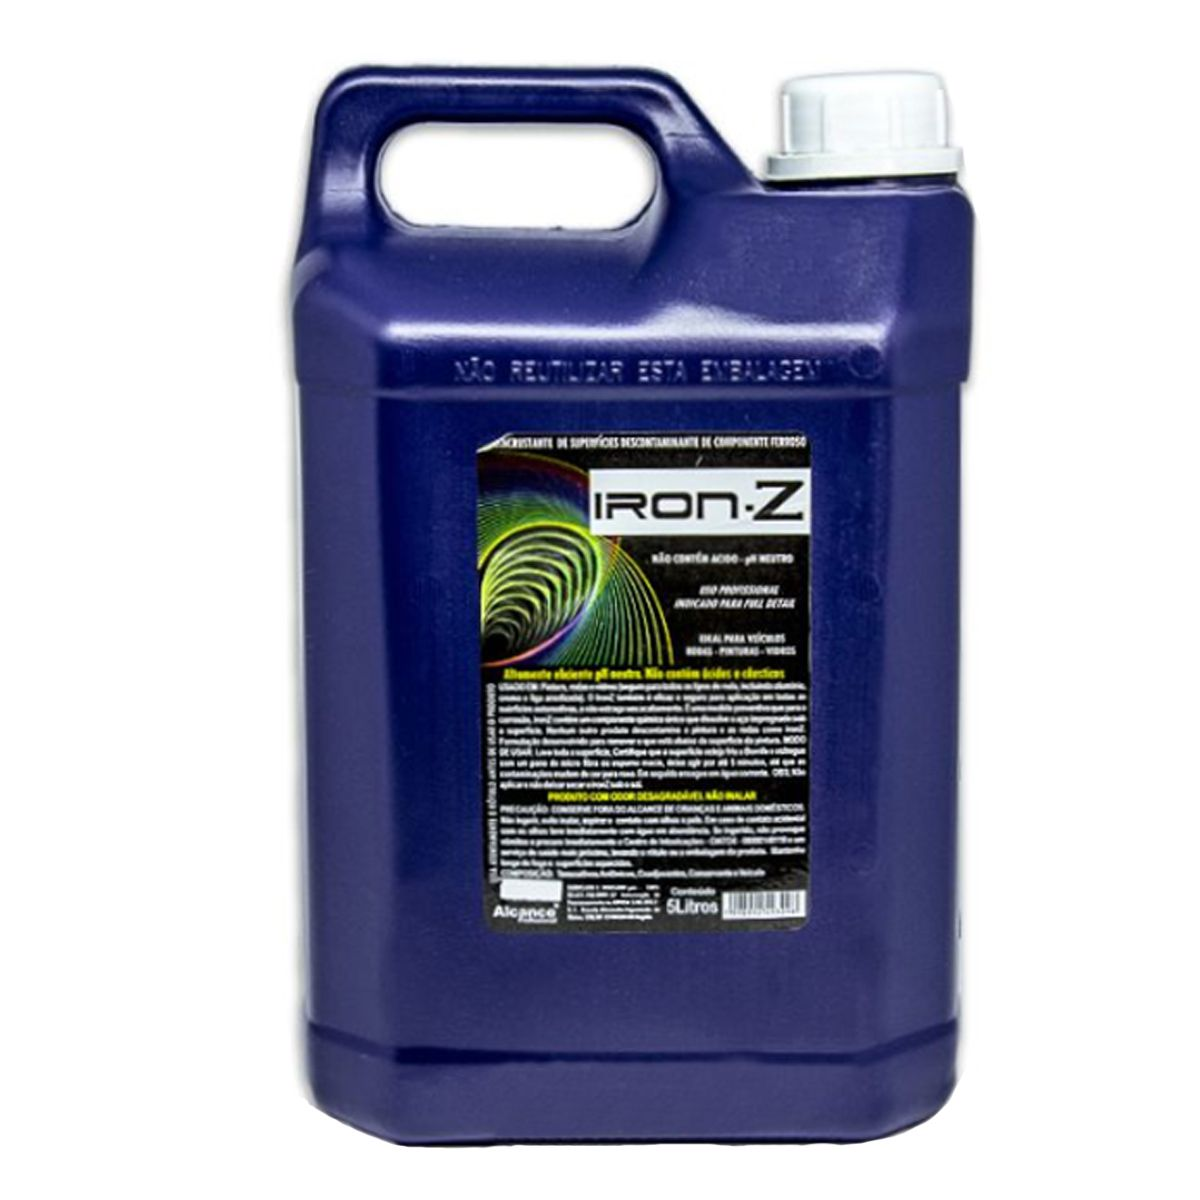 Desincrustante e Descontaminante Profissional Iron-Z 5 Litros Alcance